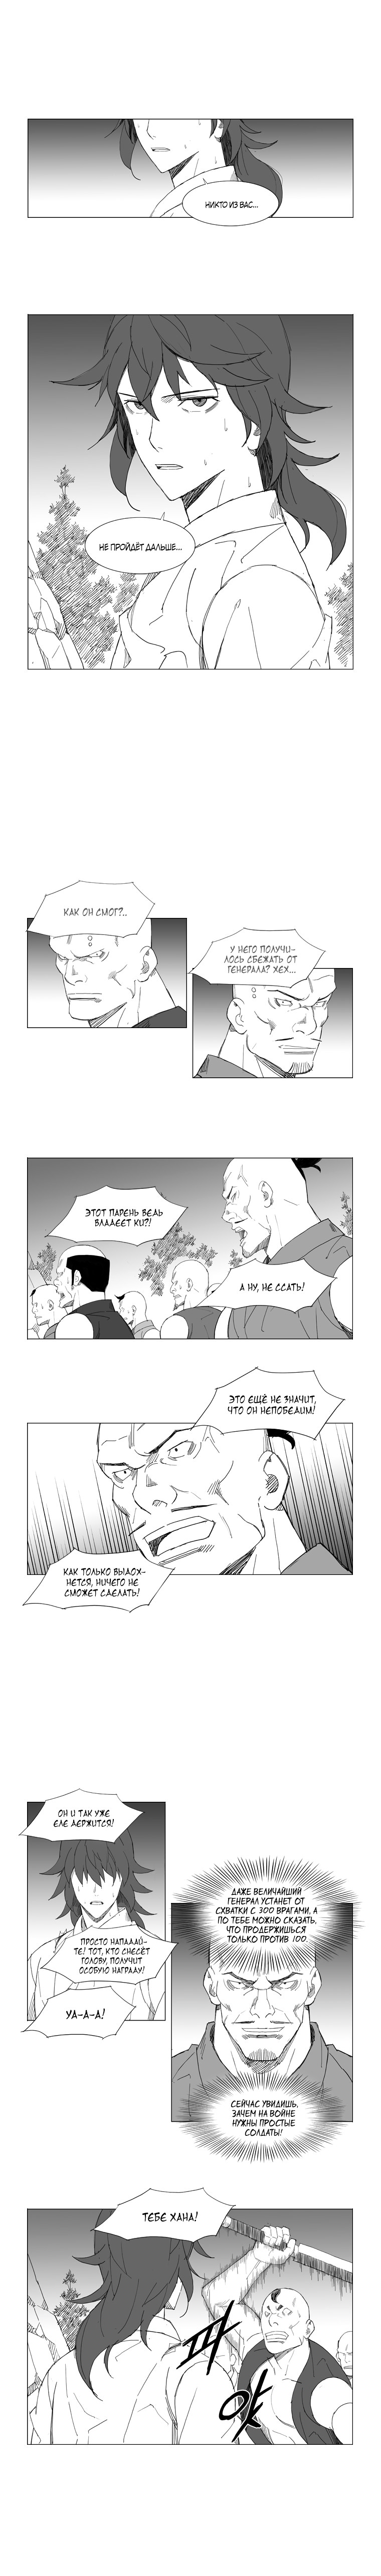 https://r1.ninemanga.com/comics/pic2/39/28263/331326/1502309152928.jpg Page 3